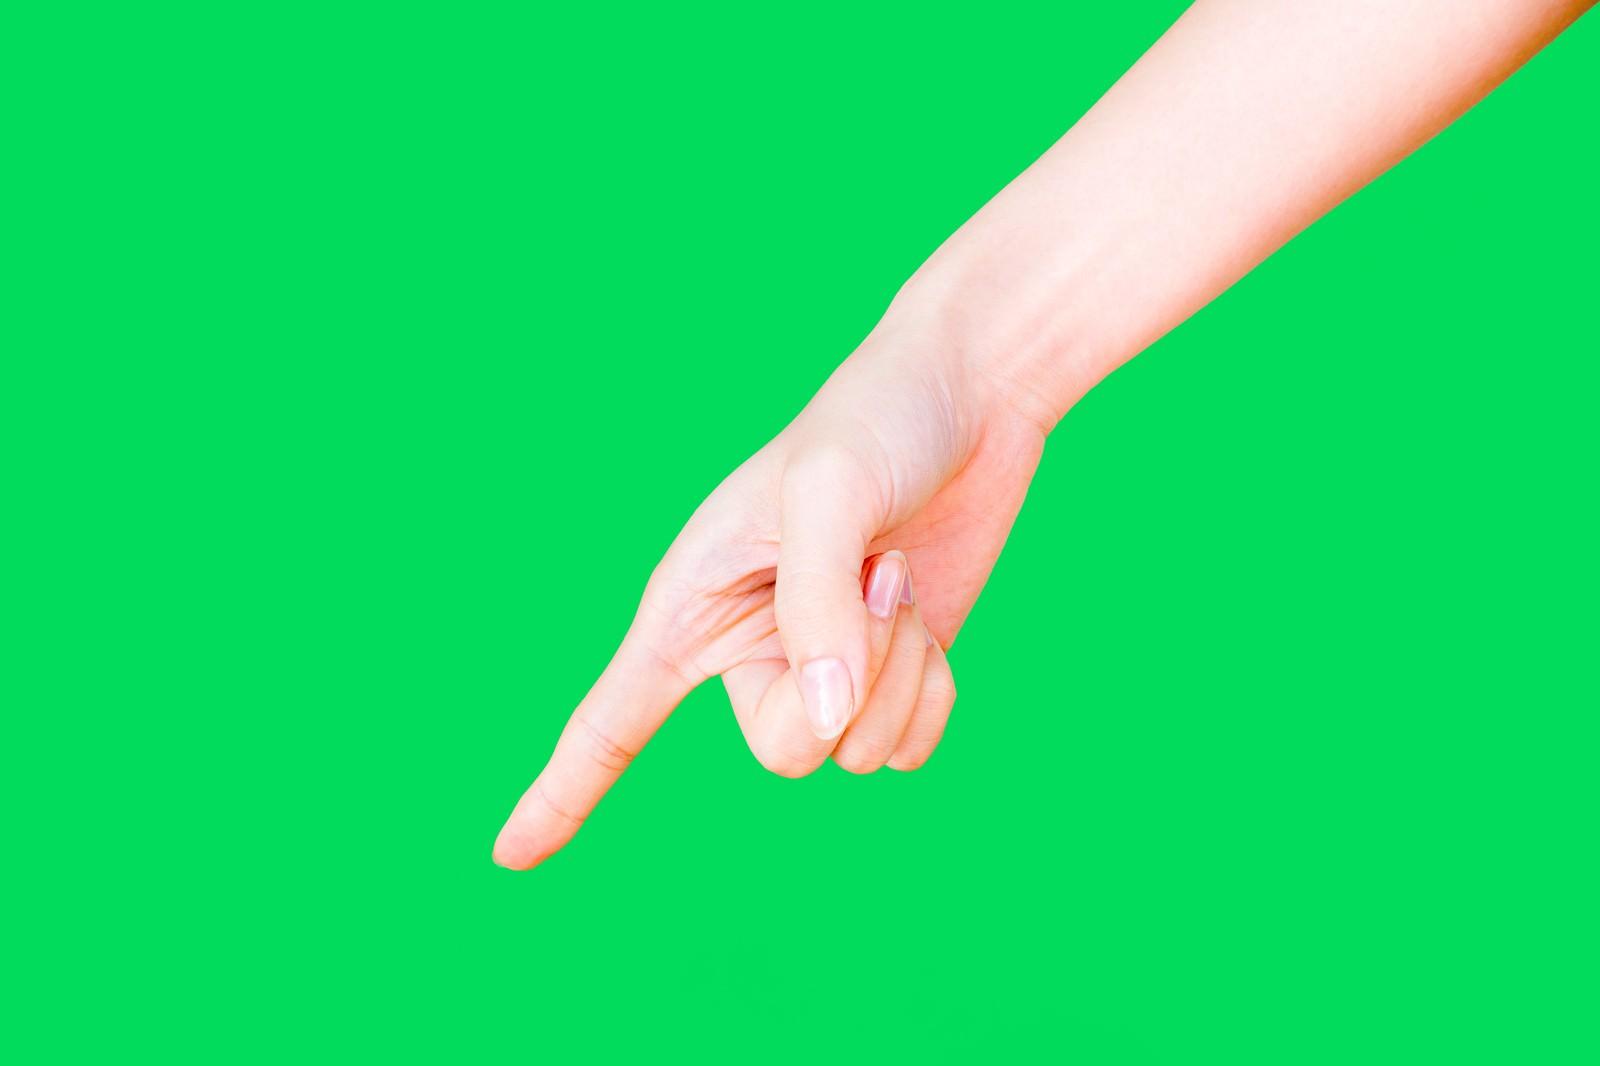 Green yubiwosasuyo tp v